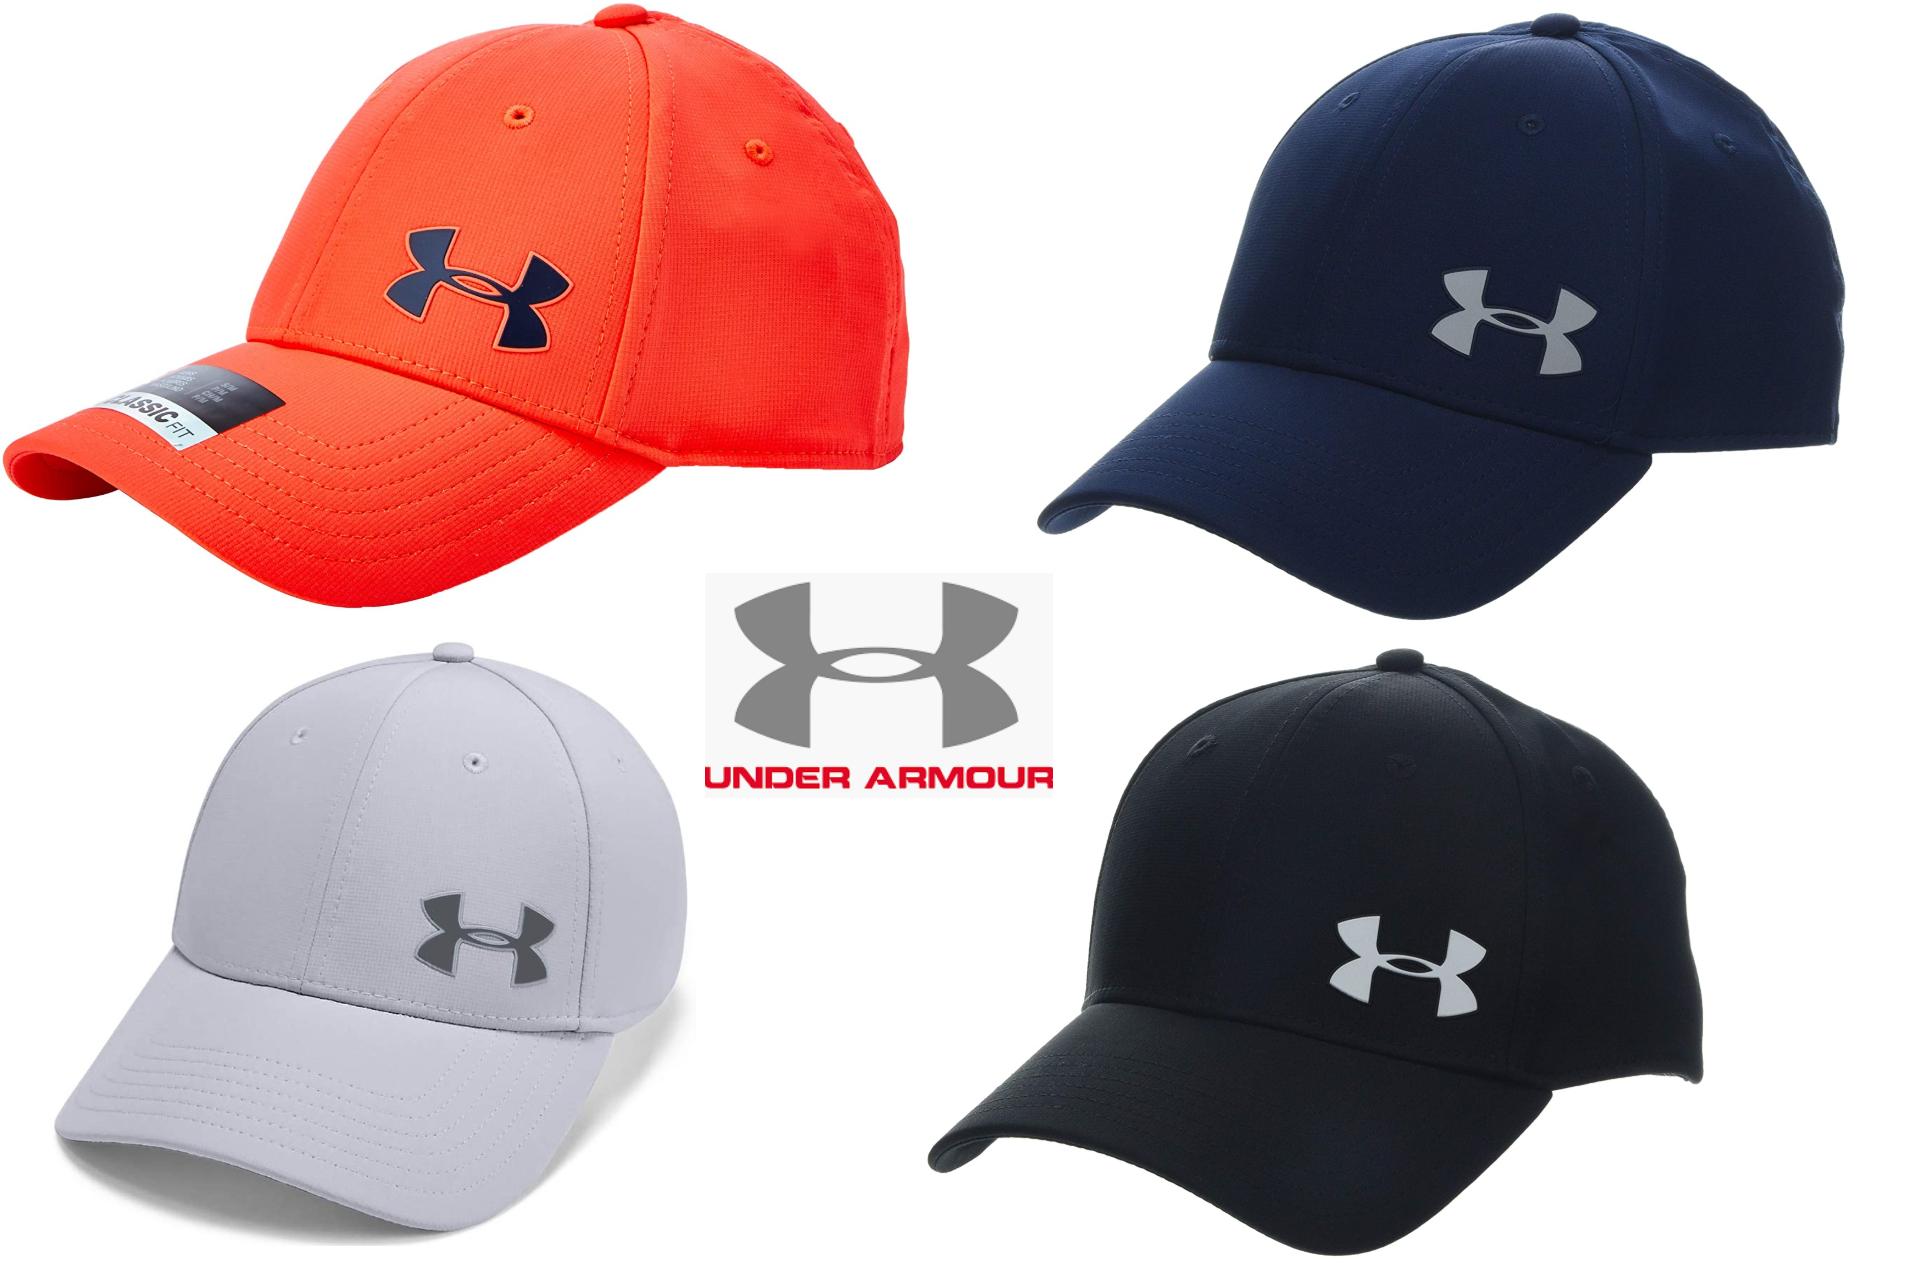 4 COLORES - Under Armour Golf Headline 3.0 C Gorra con Logo Frontal